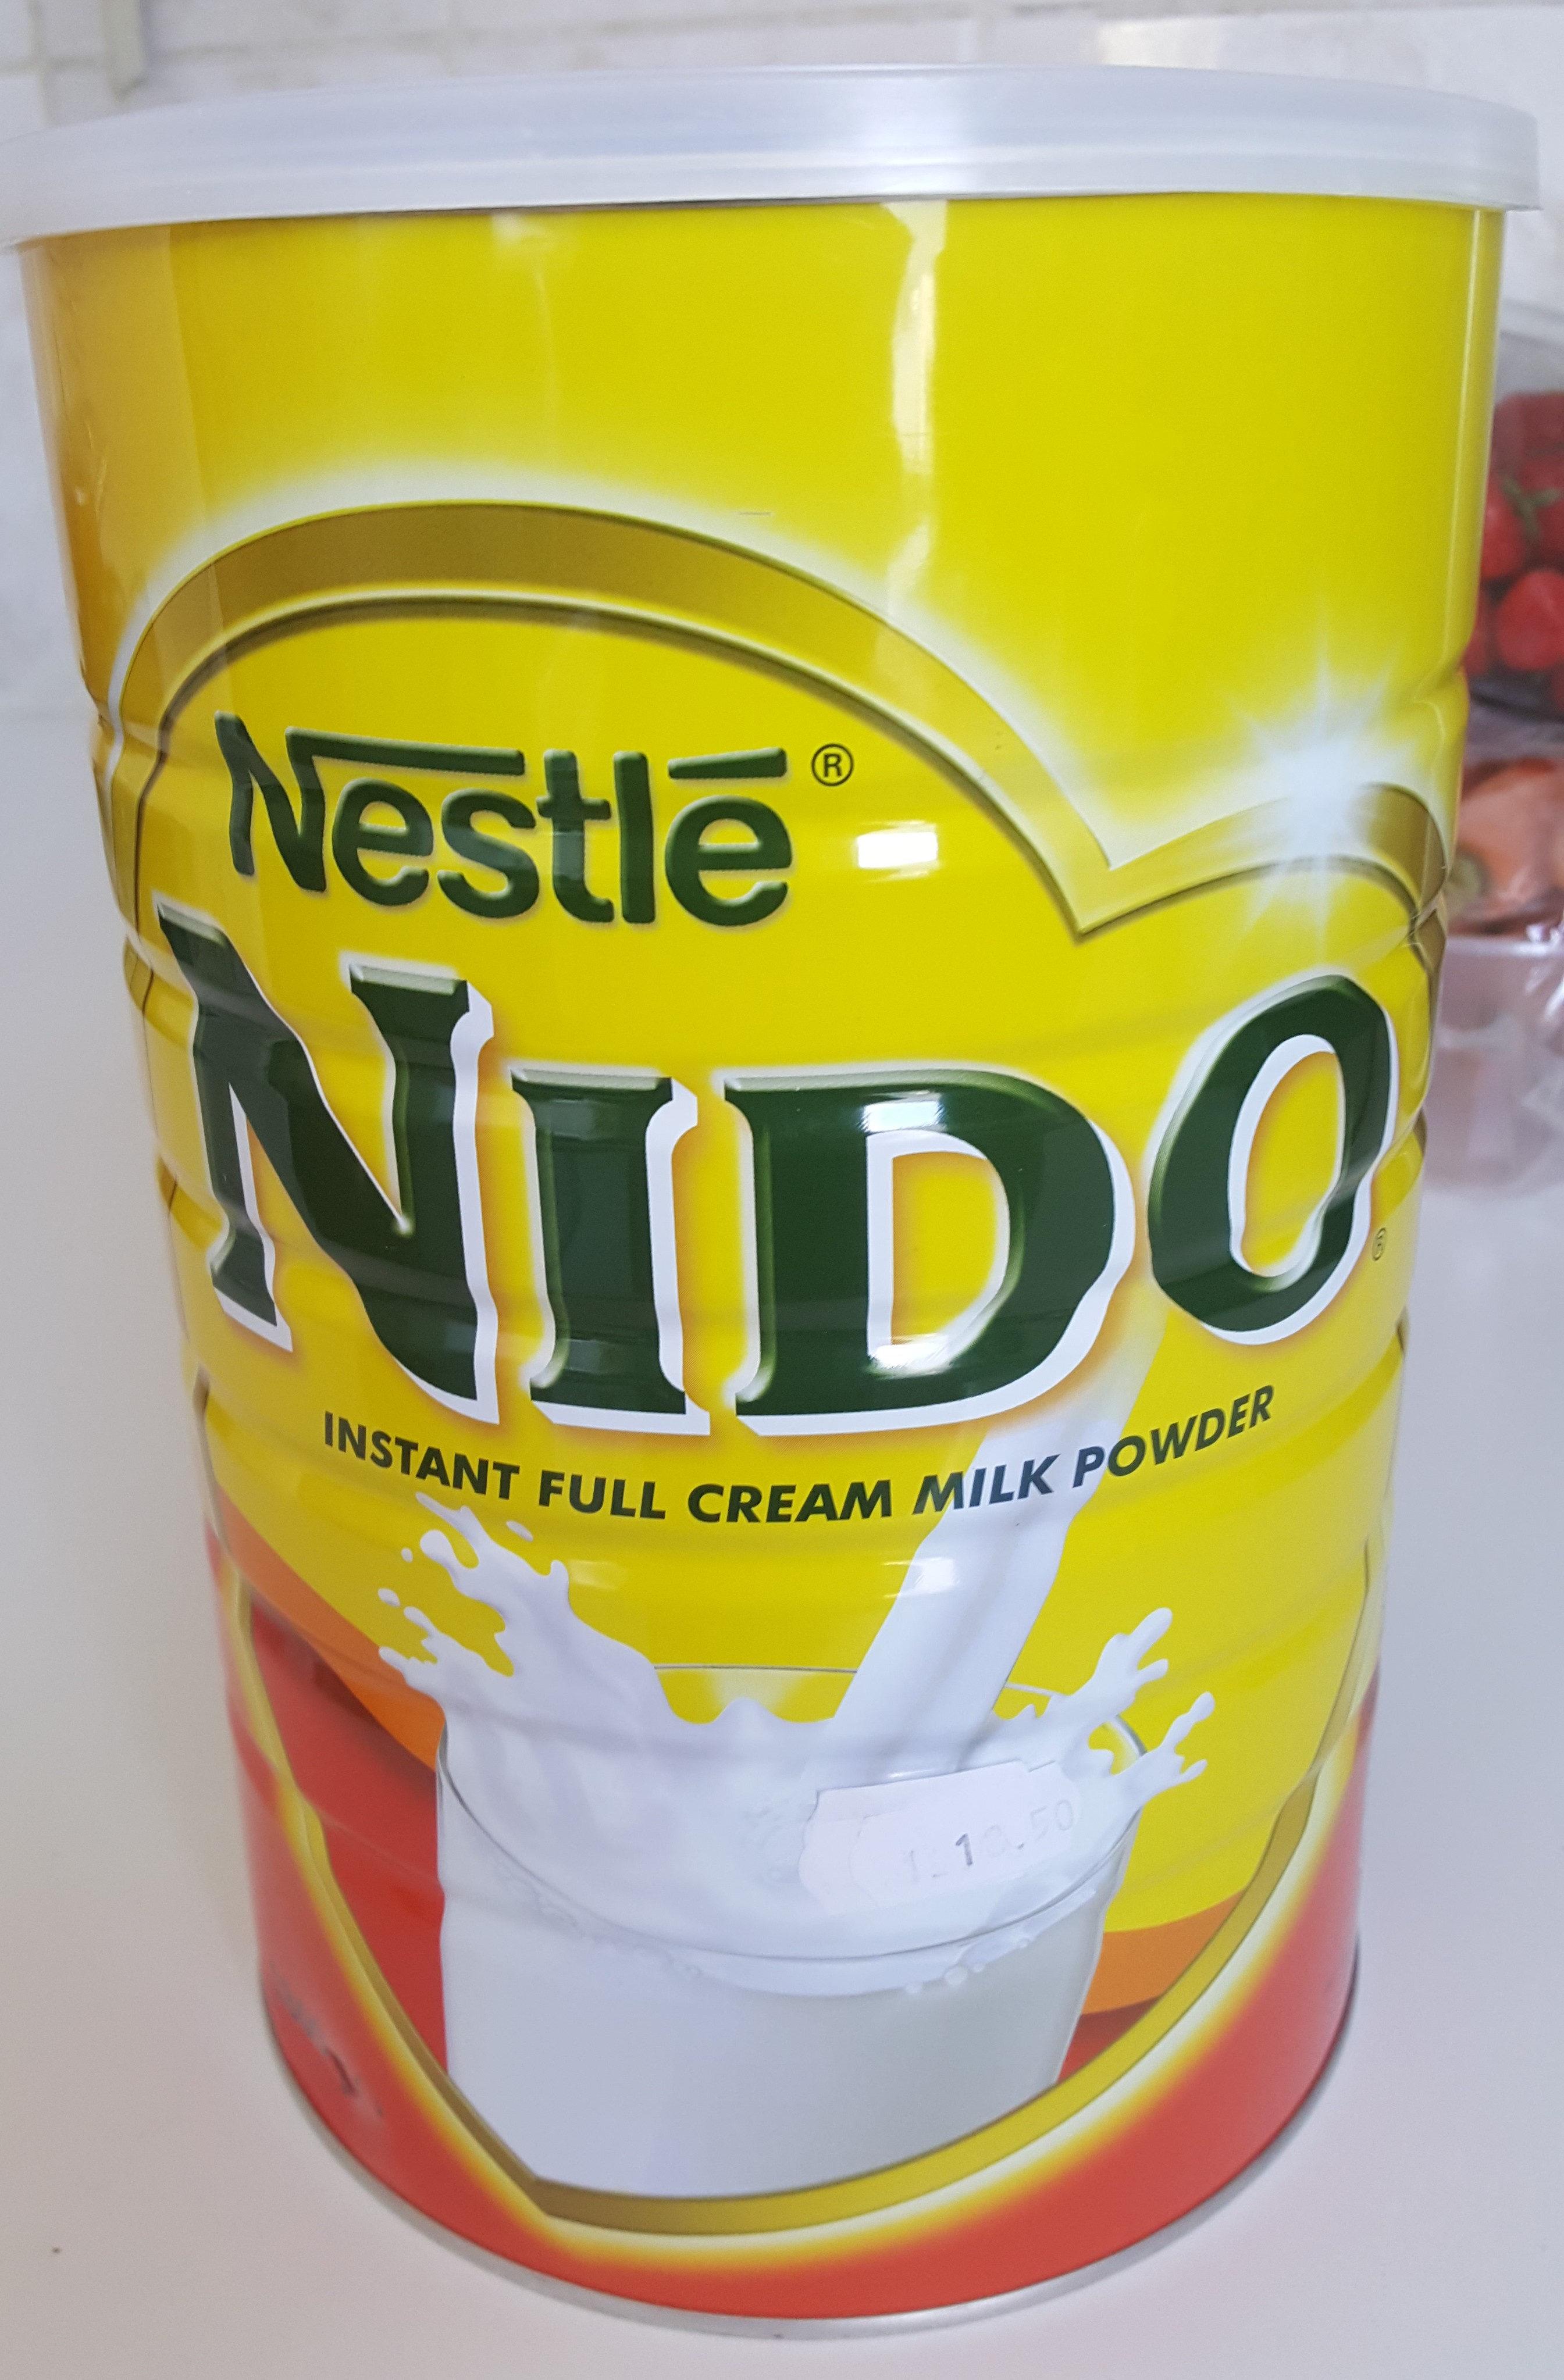 Nido - Product - fr